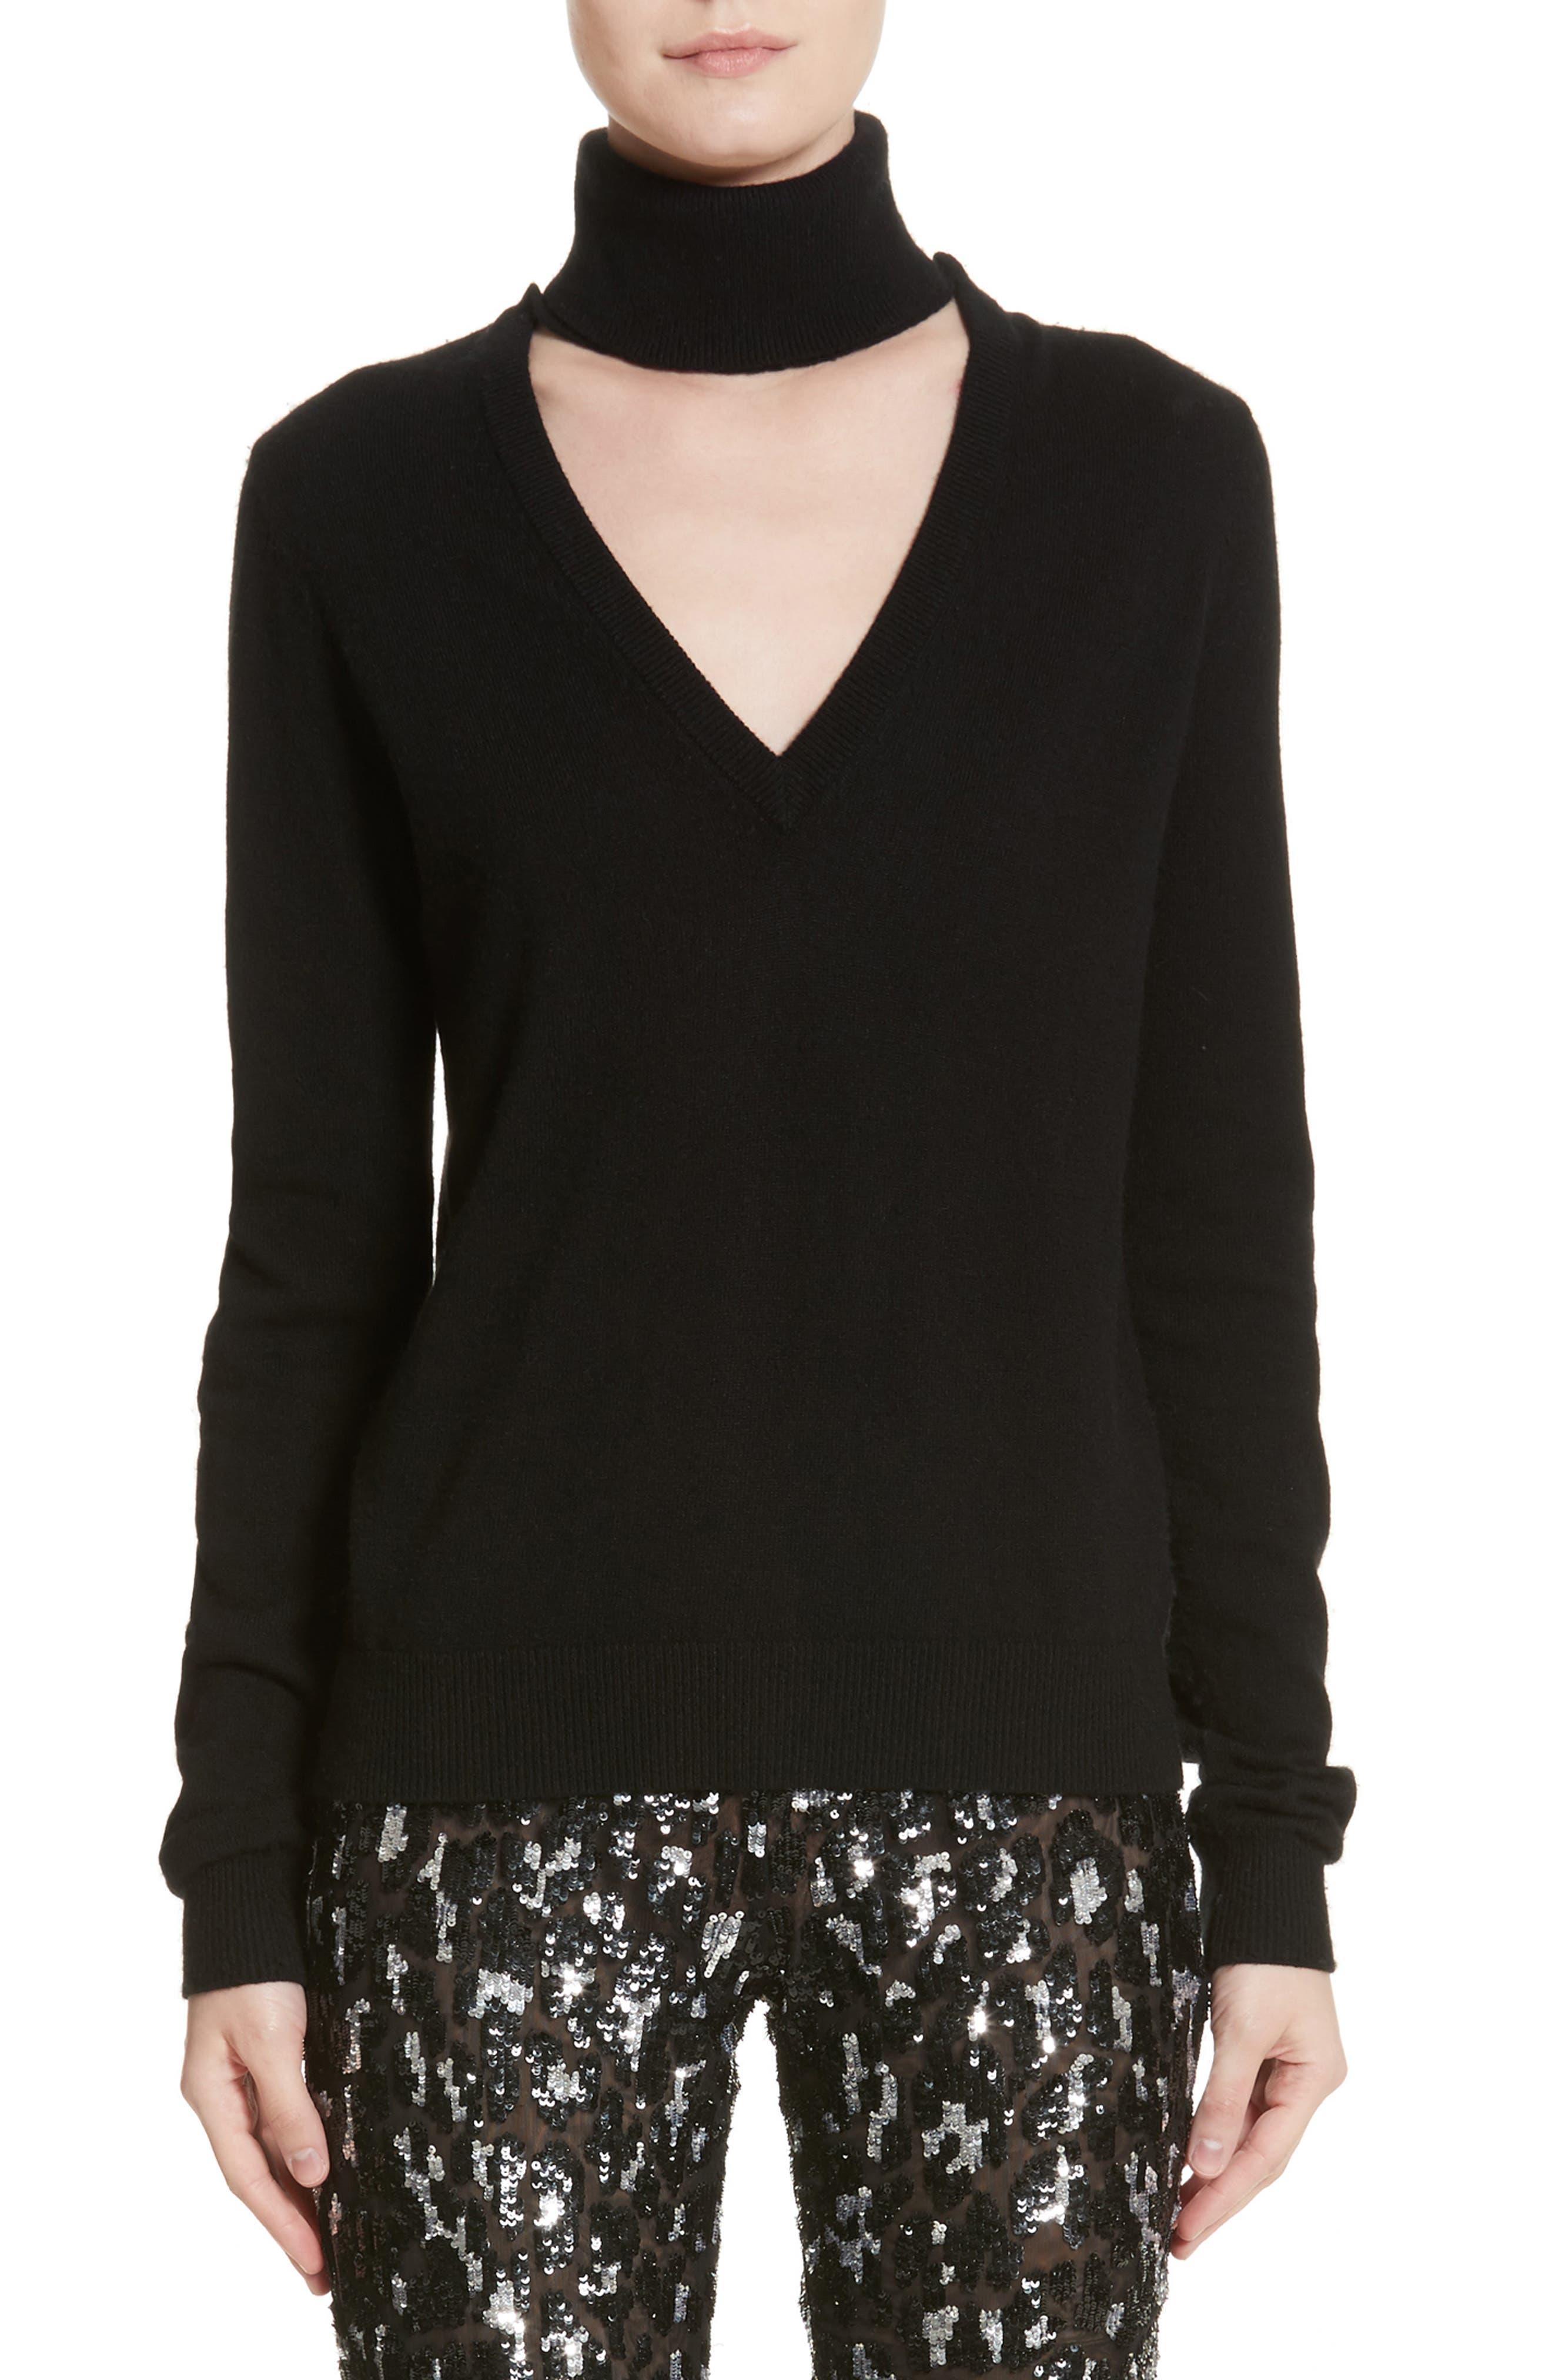 Main Image - Michael Kors Cutout Turtleneck Cashmere Sweater